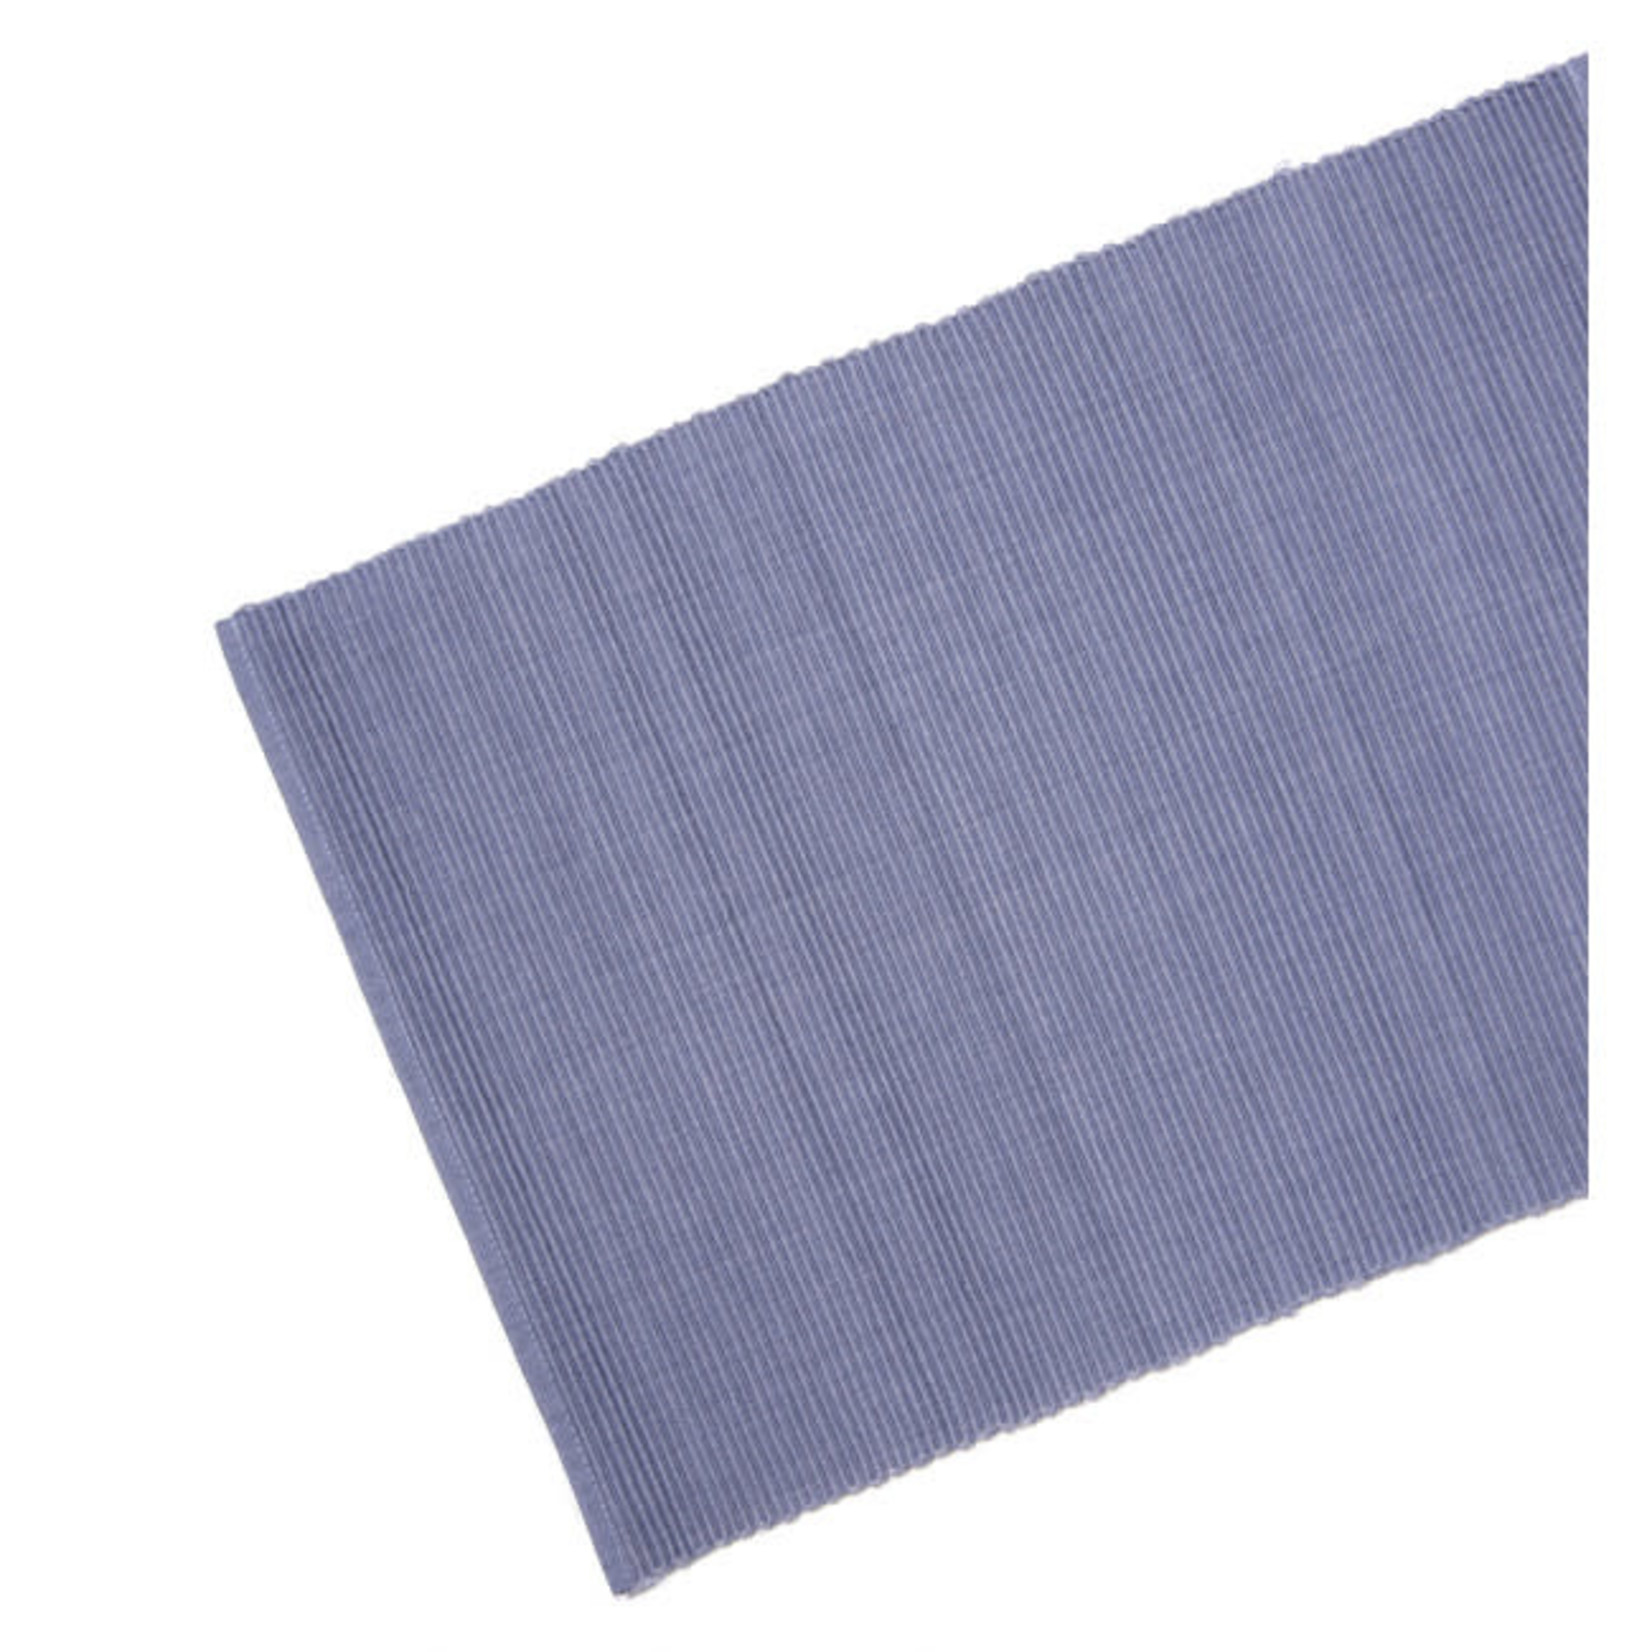 Table Runner Ribbed - Grey